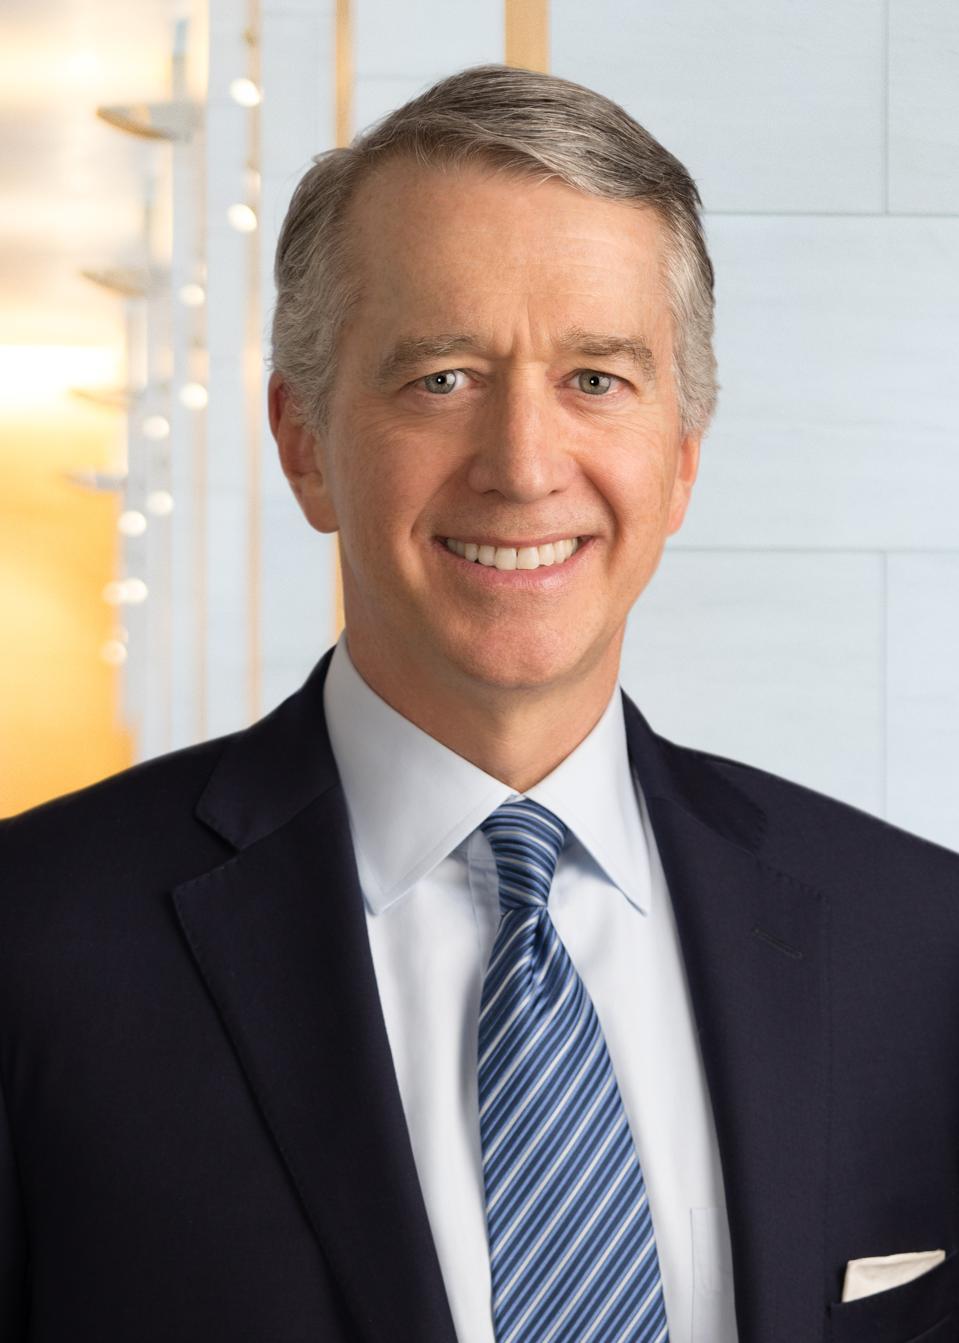 Goldman Sachs Global Head of Wealth Management Tucker York